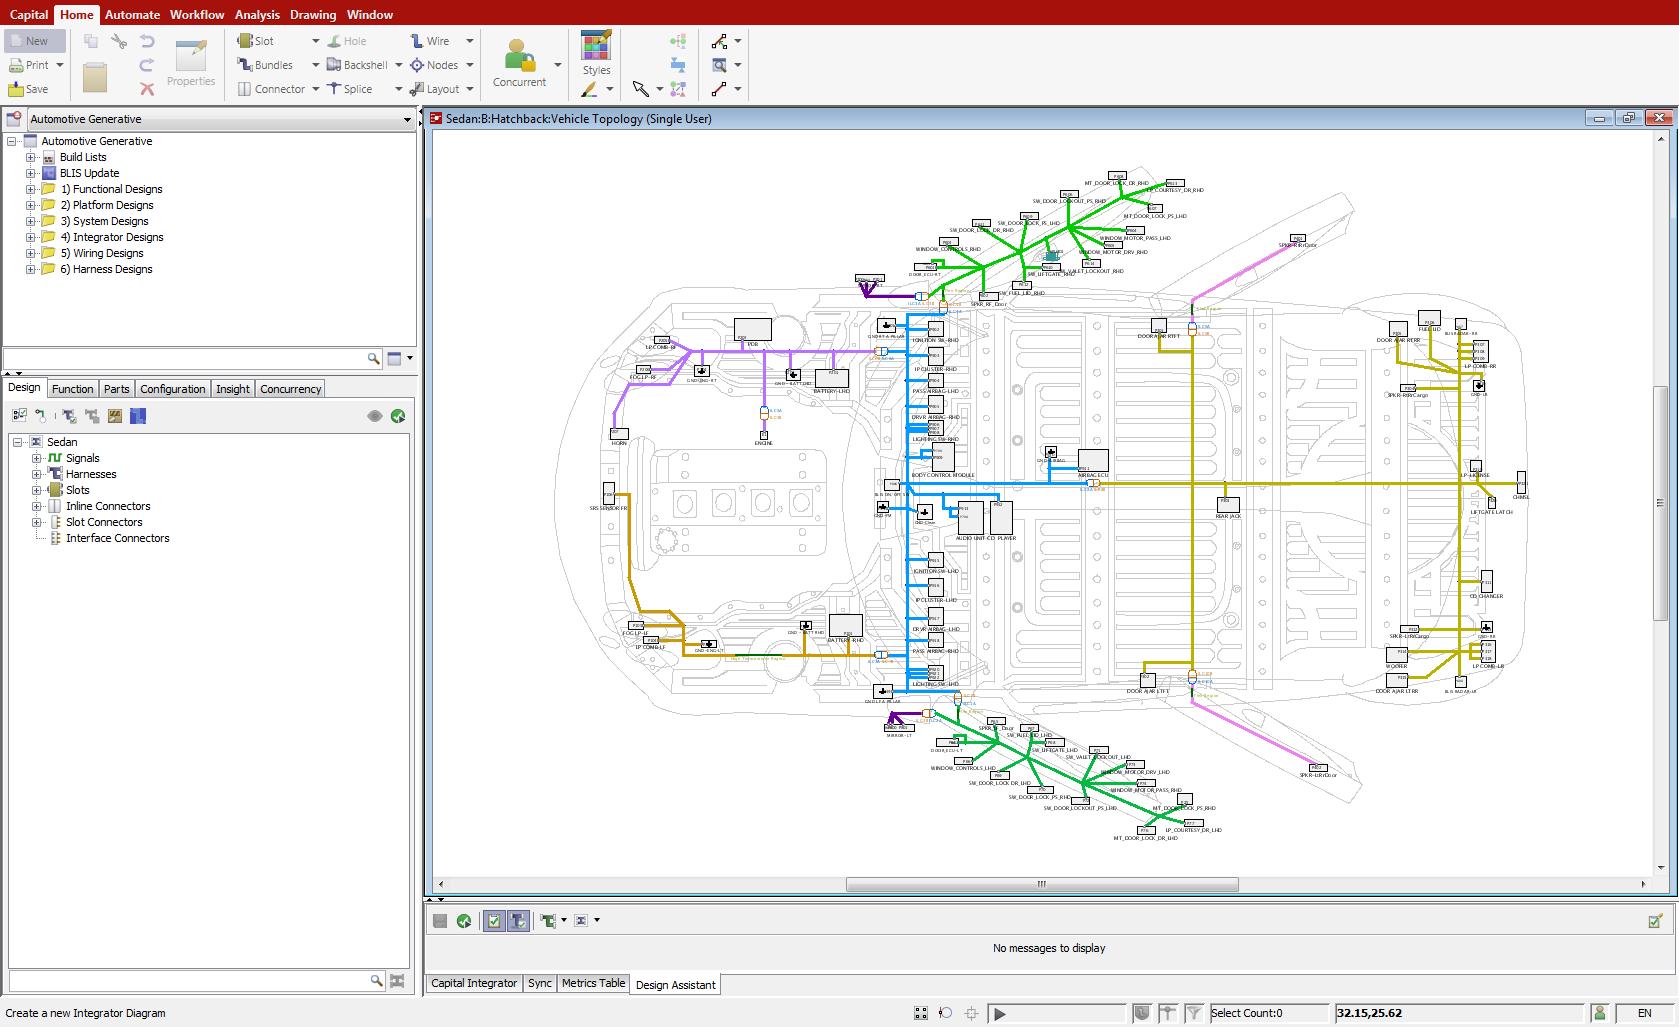 capital integrator electrical design automation mentor graphics rh mentor com